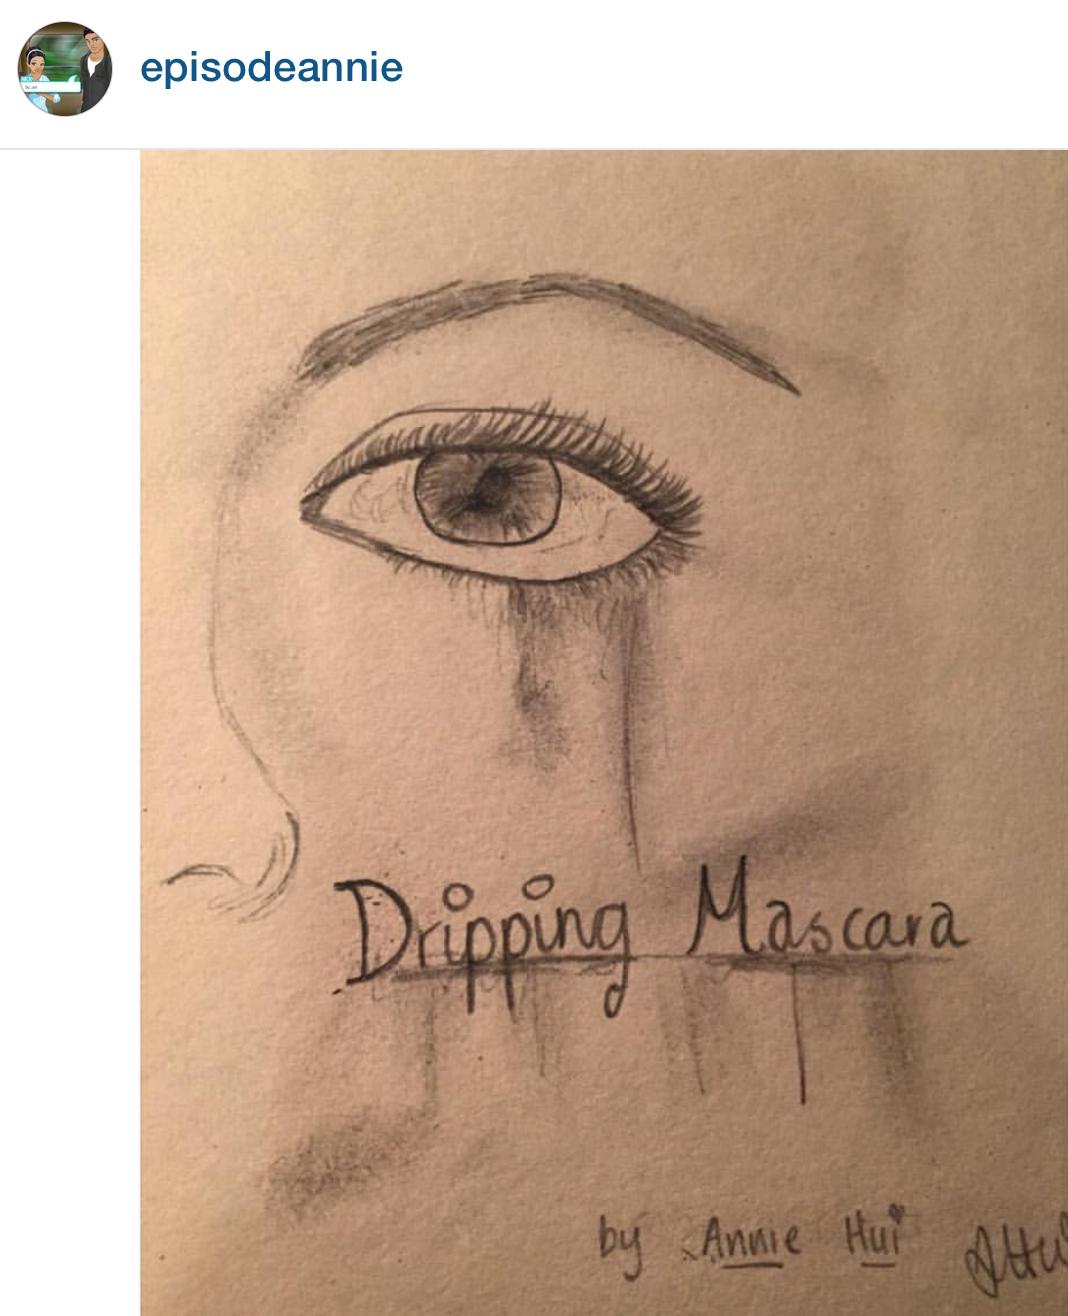 """Dripping Mascara"" by @episodeannie"